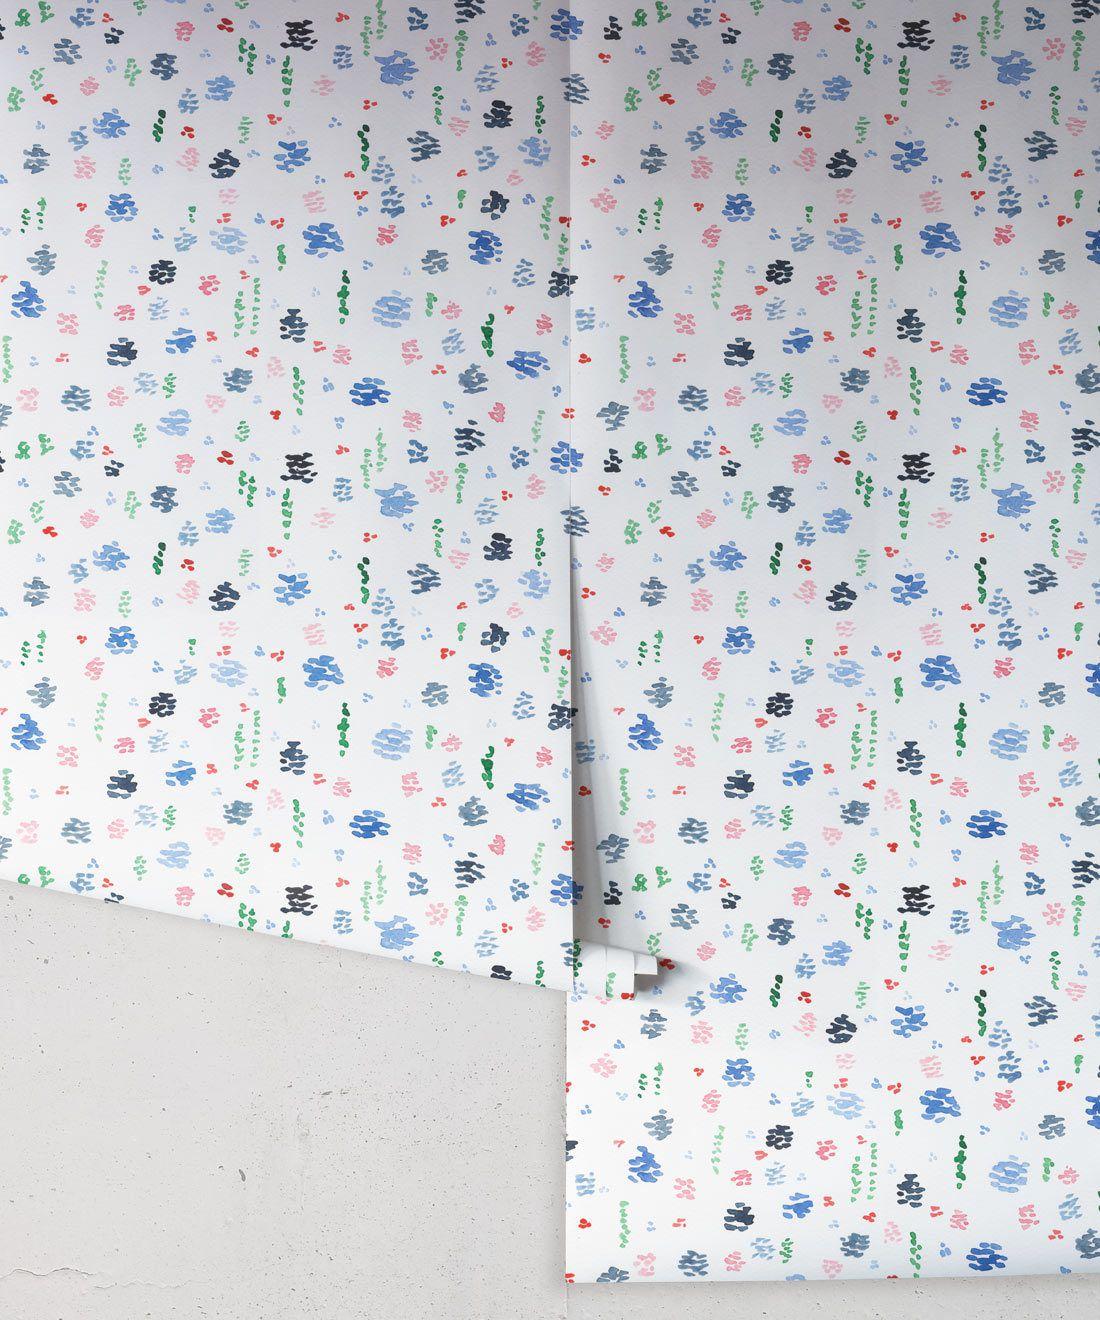 Spring Garden • Abstract Inky Floral Wallpaper • Georgia MacMillan • Kids Wallpaper • Nursery Wallpaper • Milton & King Australia